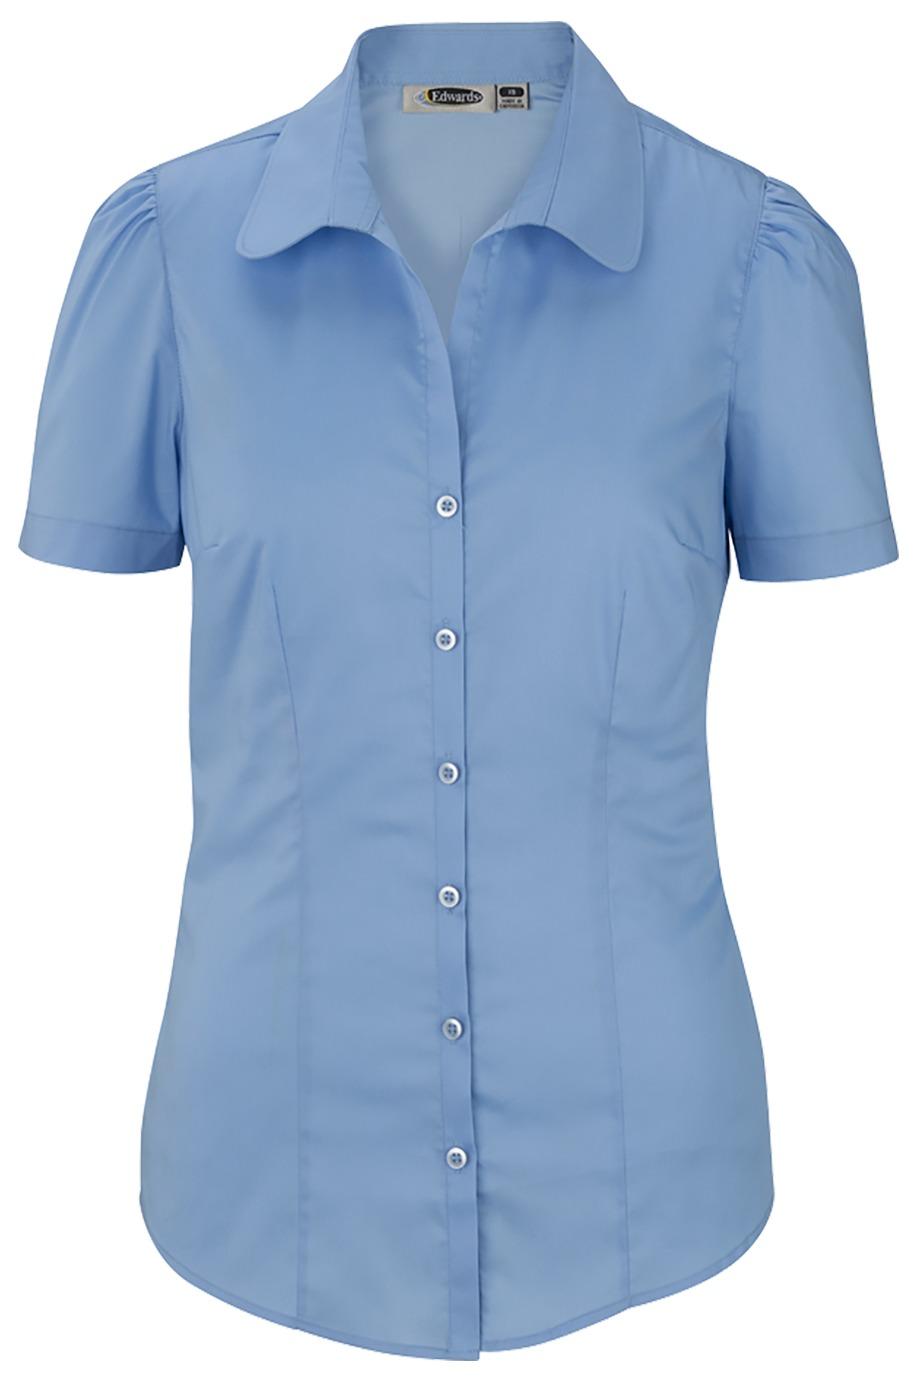 Edwards Garment 5046 - Open Neck Stretch